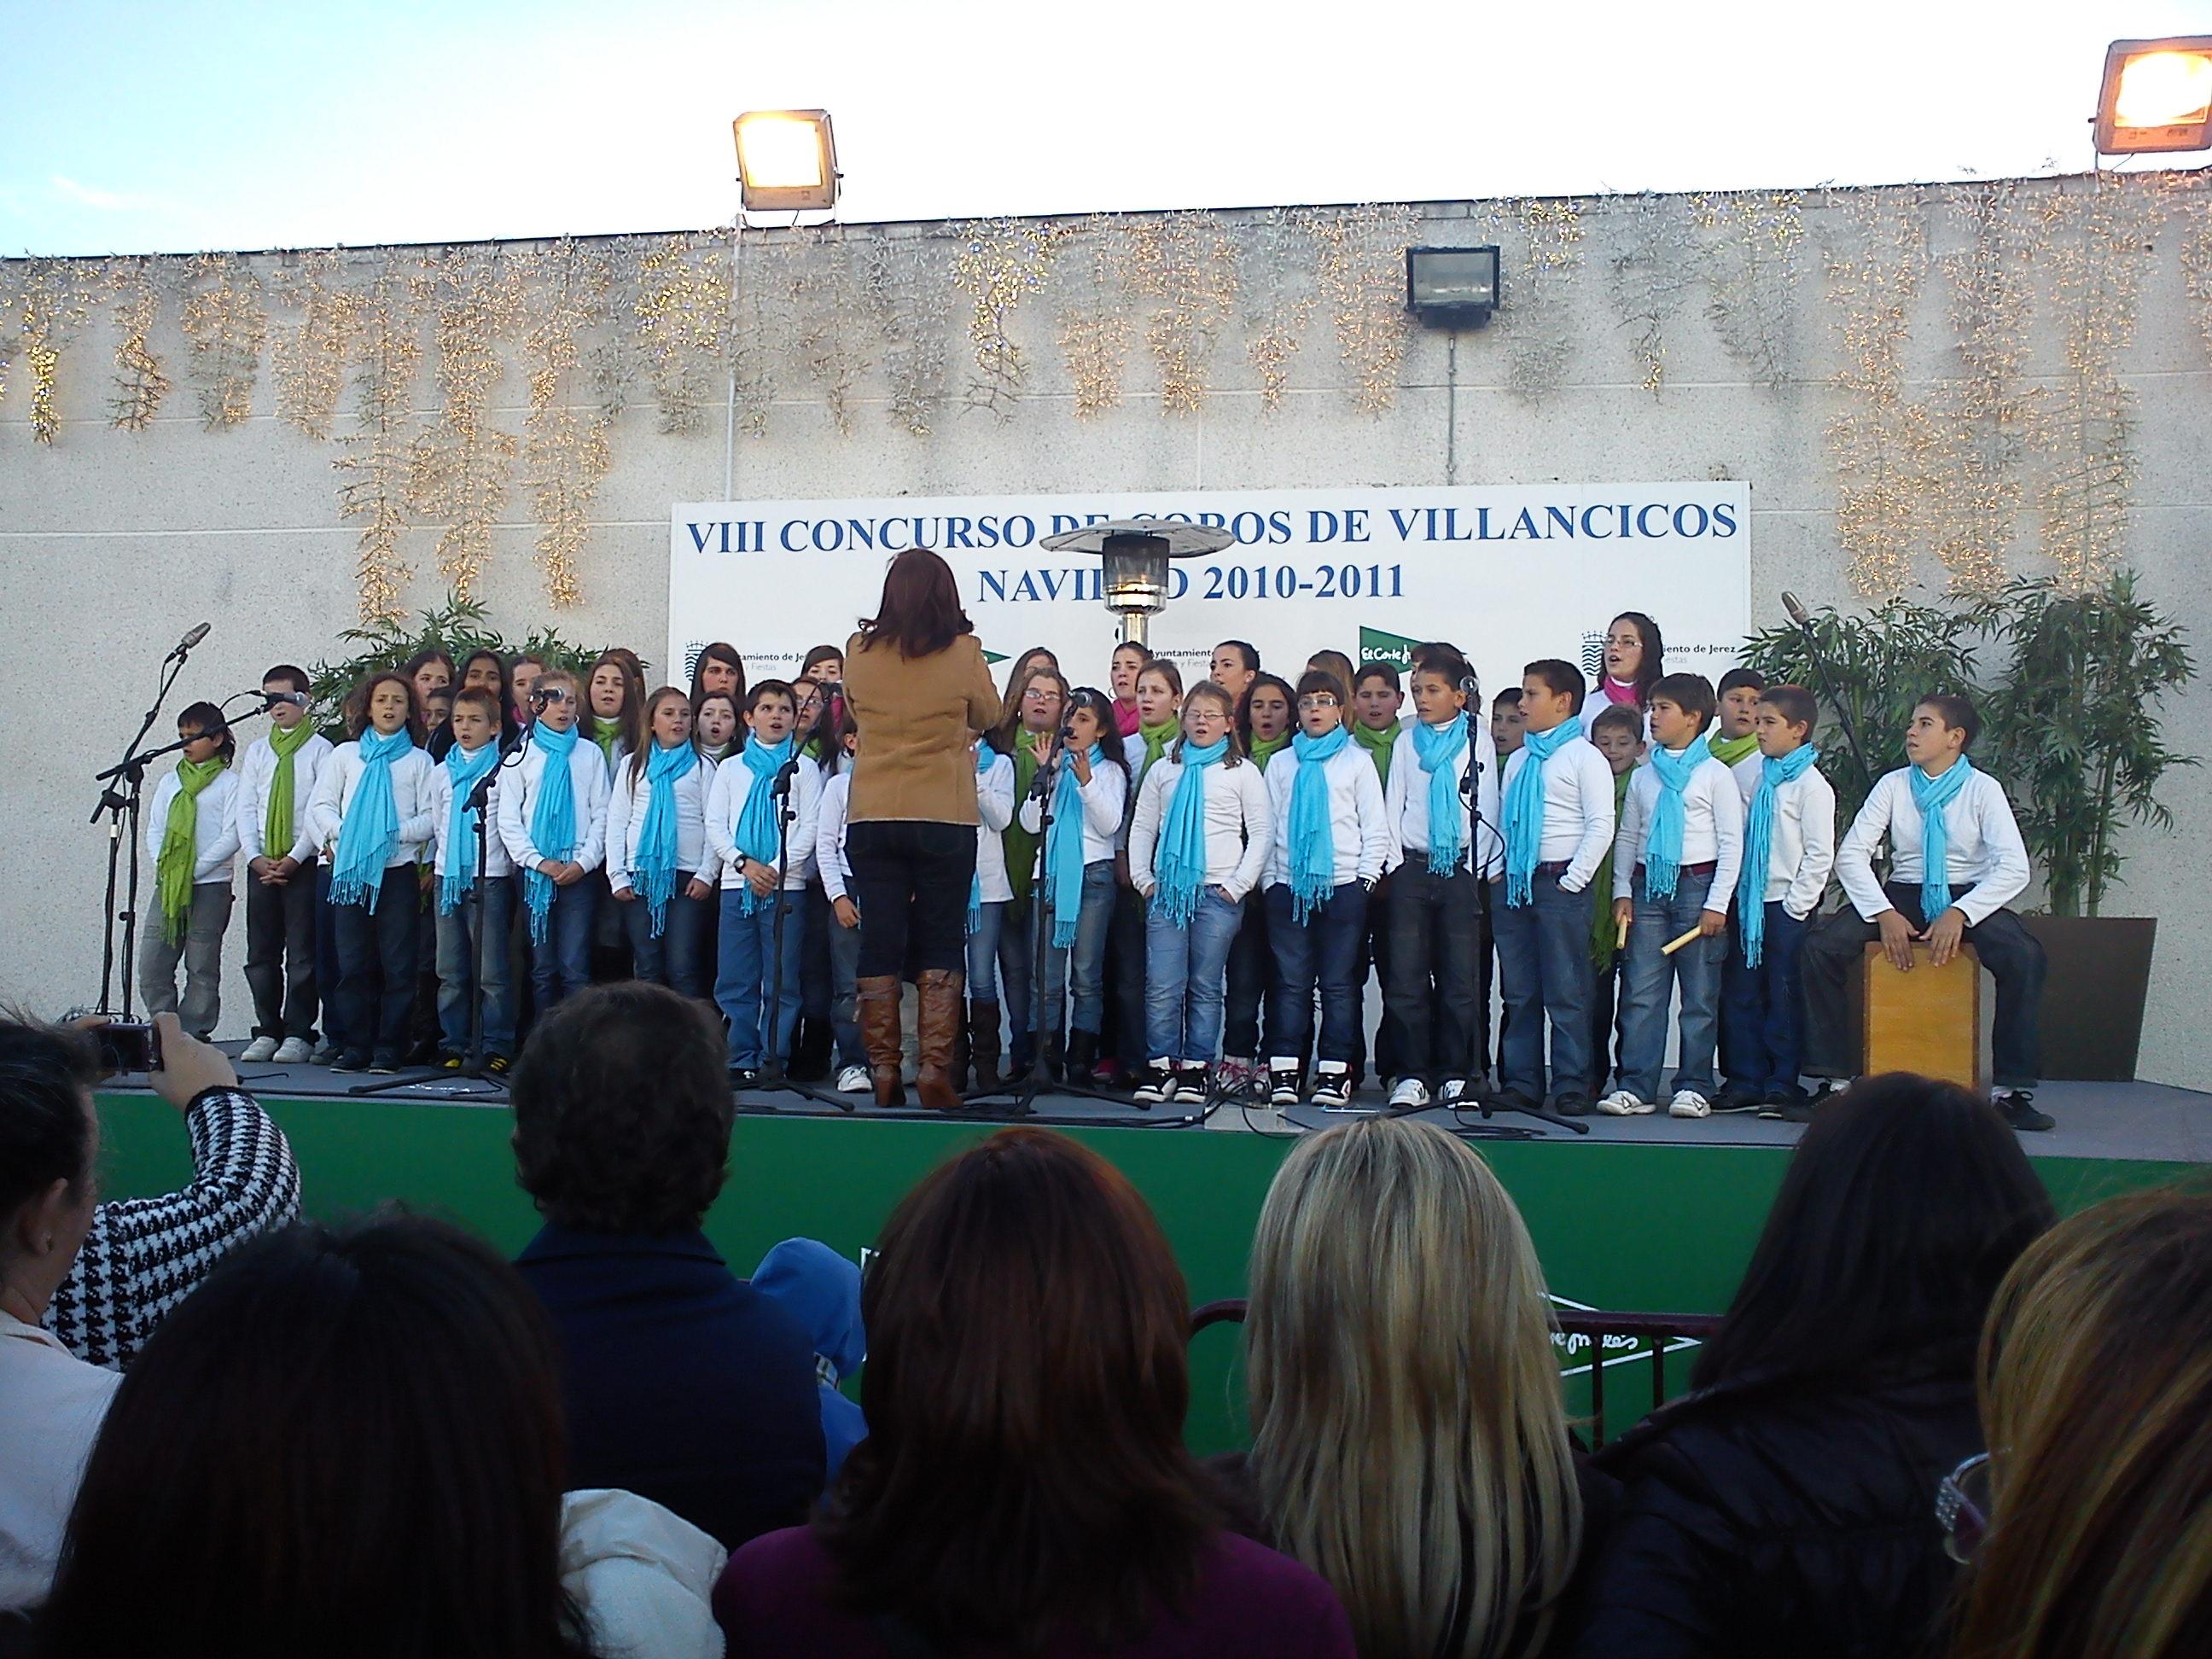 coro5